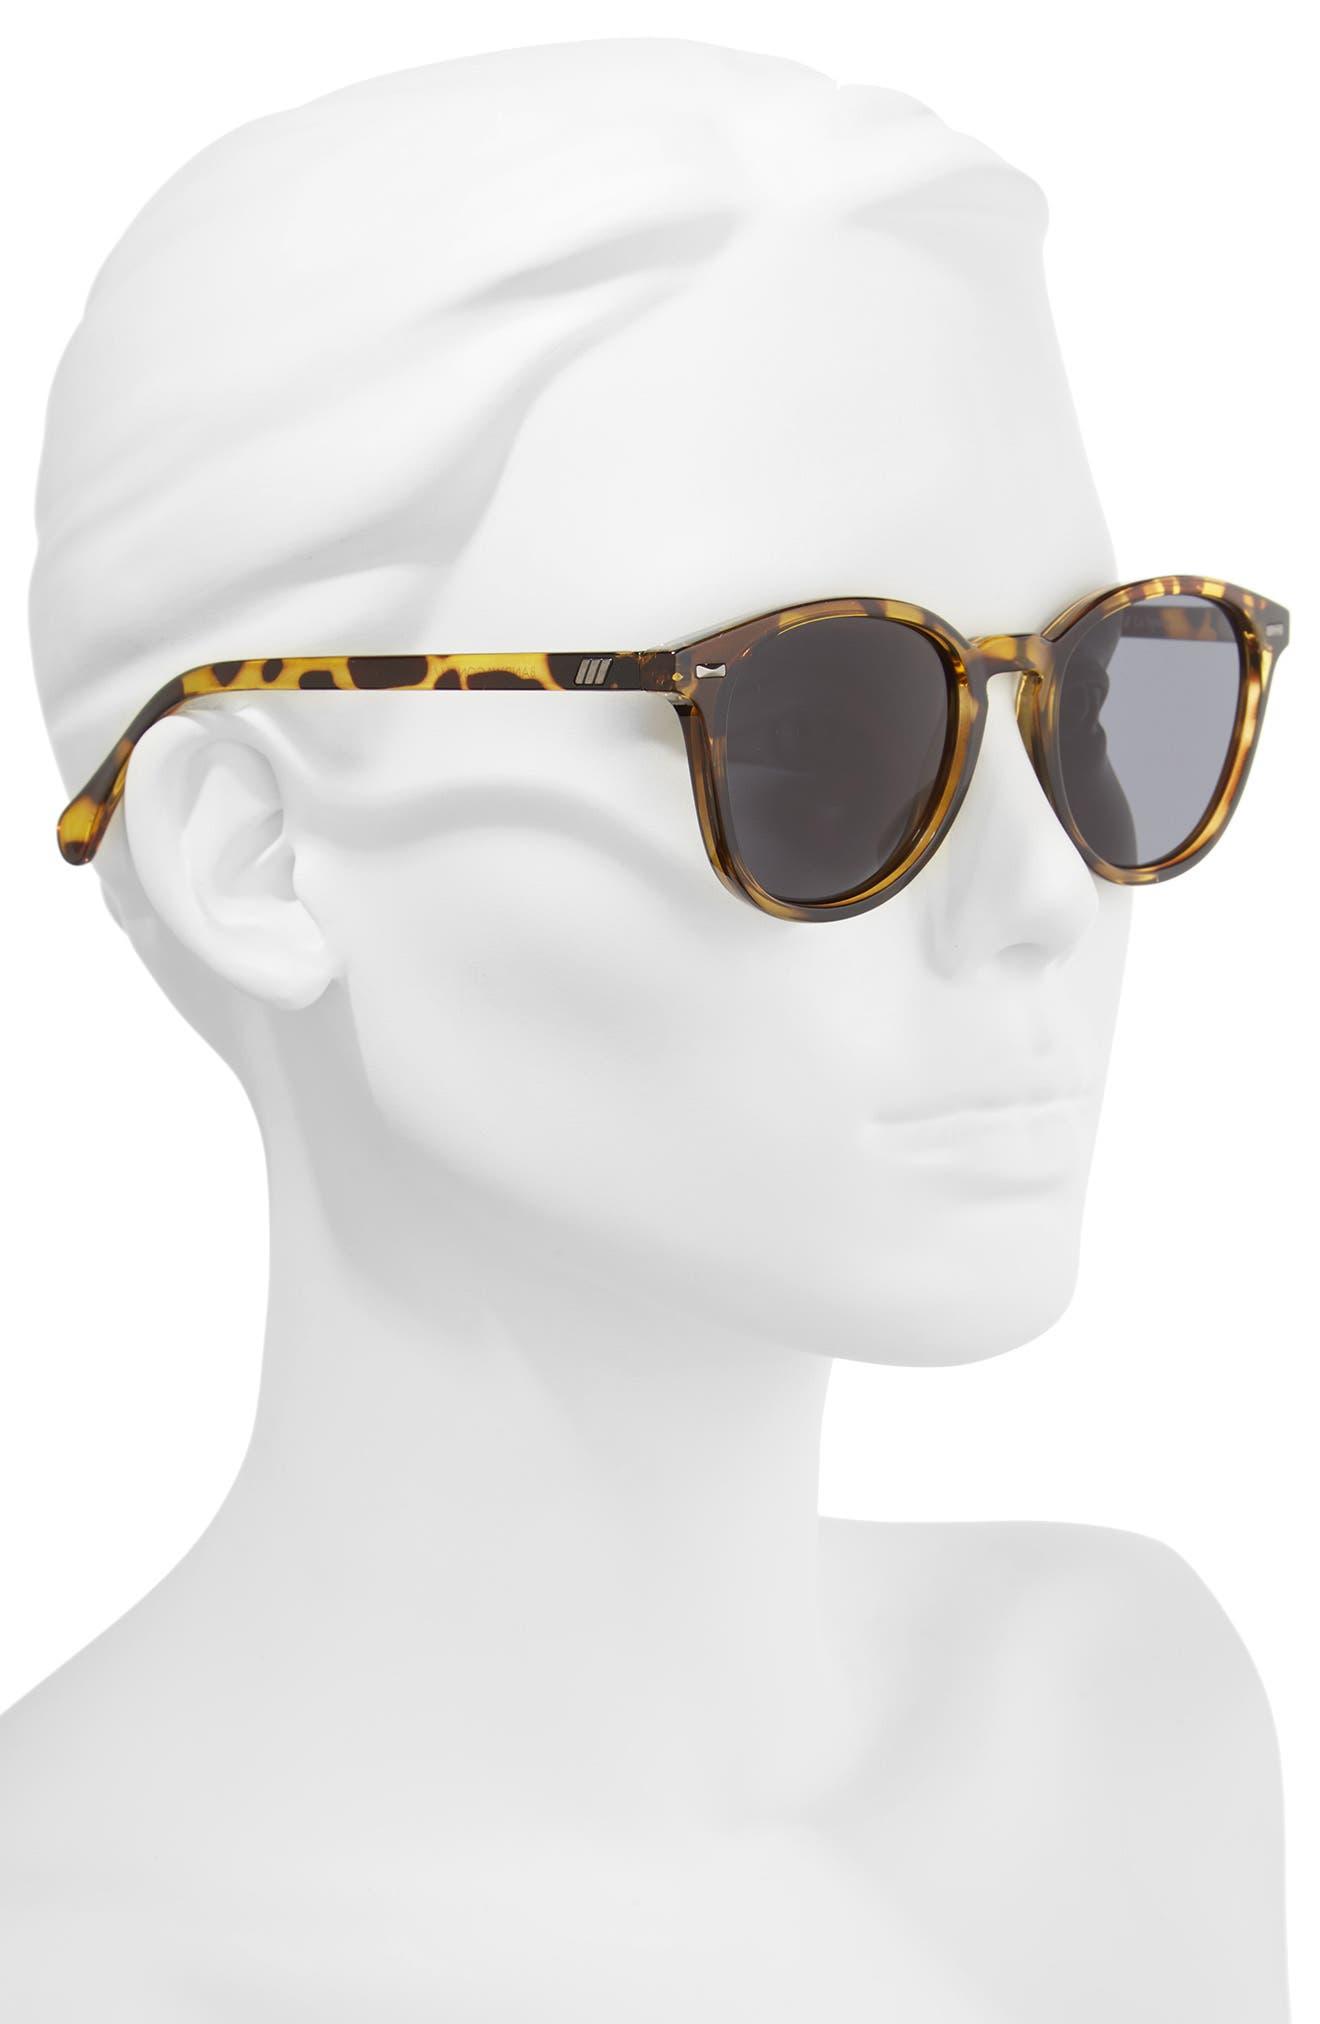 Bandwagon 50mm Sunglasses,                             Alternate thumbnail 2, color,                             SYRUP TORTOISE